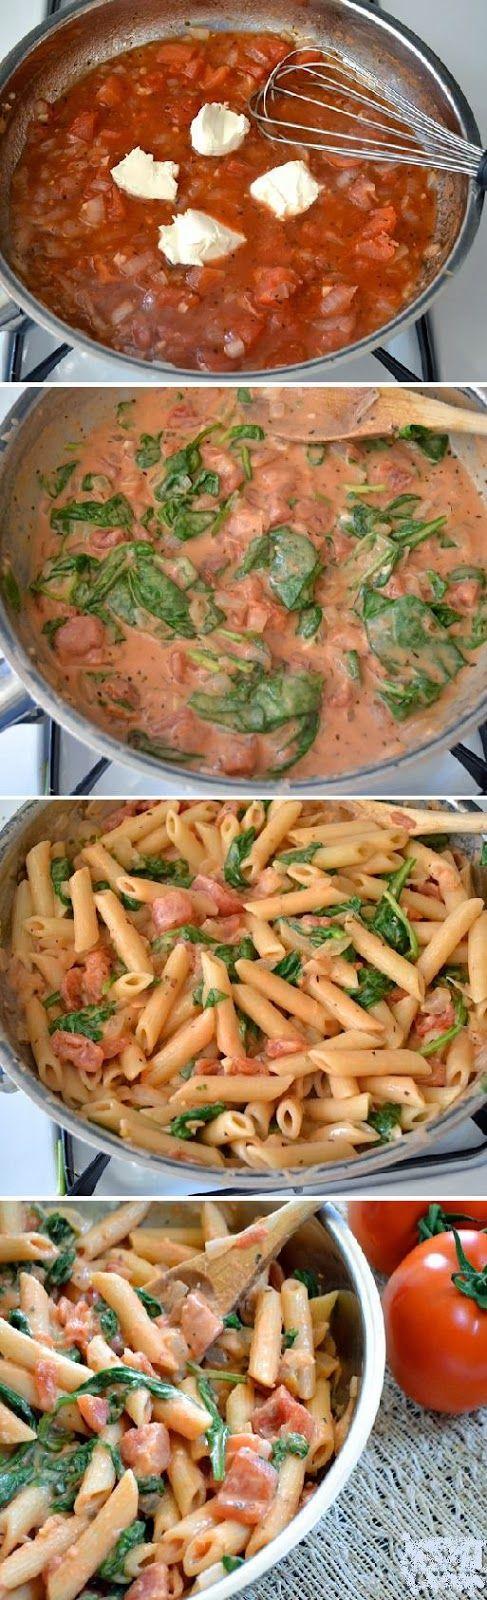 Food  Drink: Creamy Tomato  Spinach Pasta